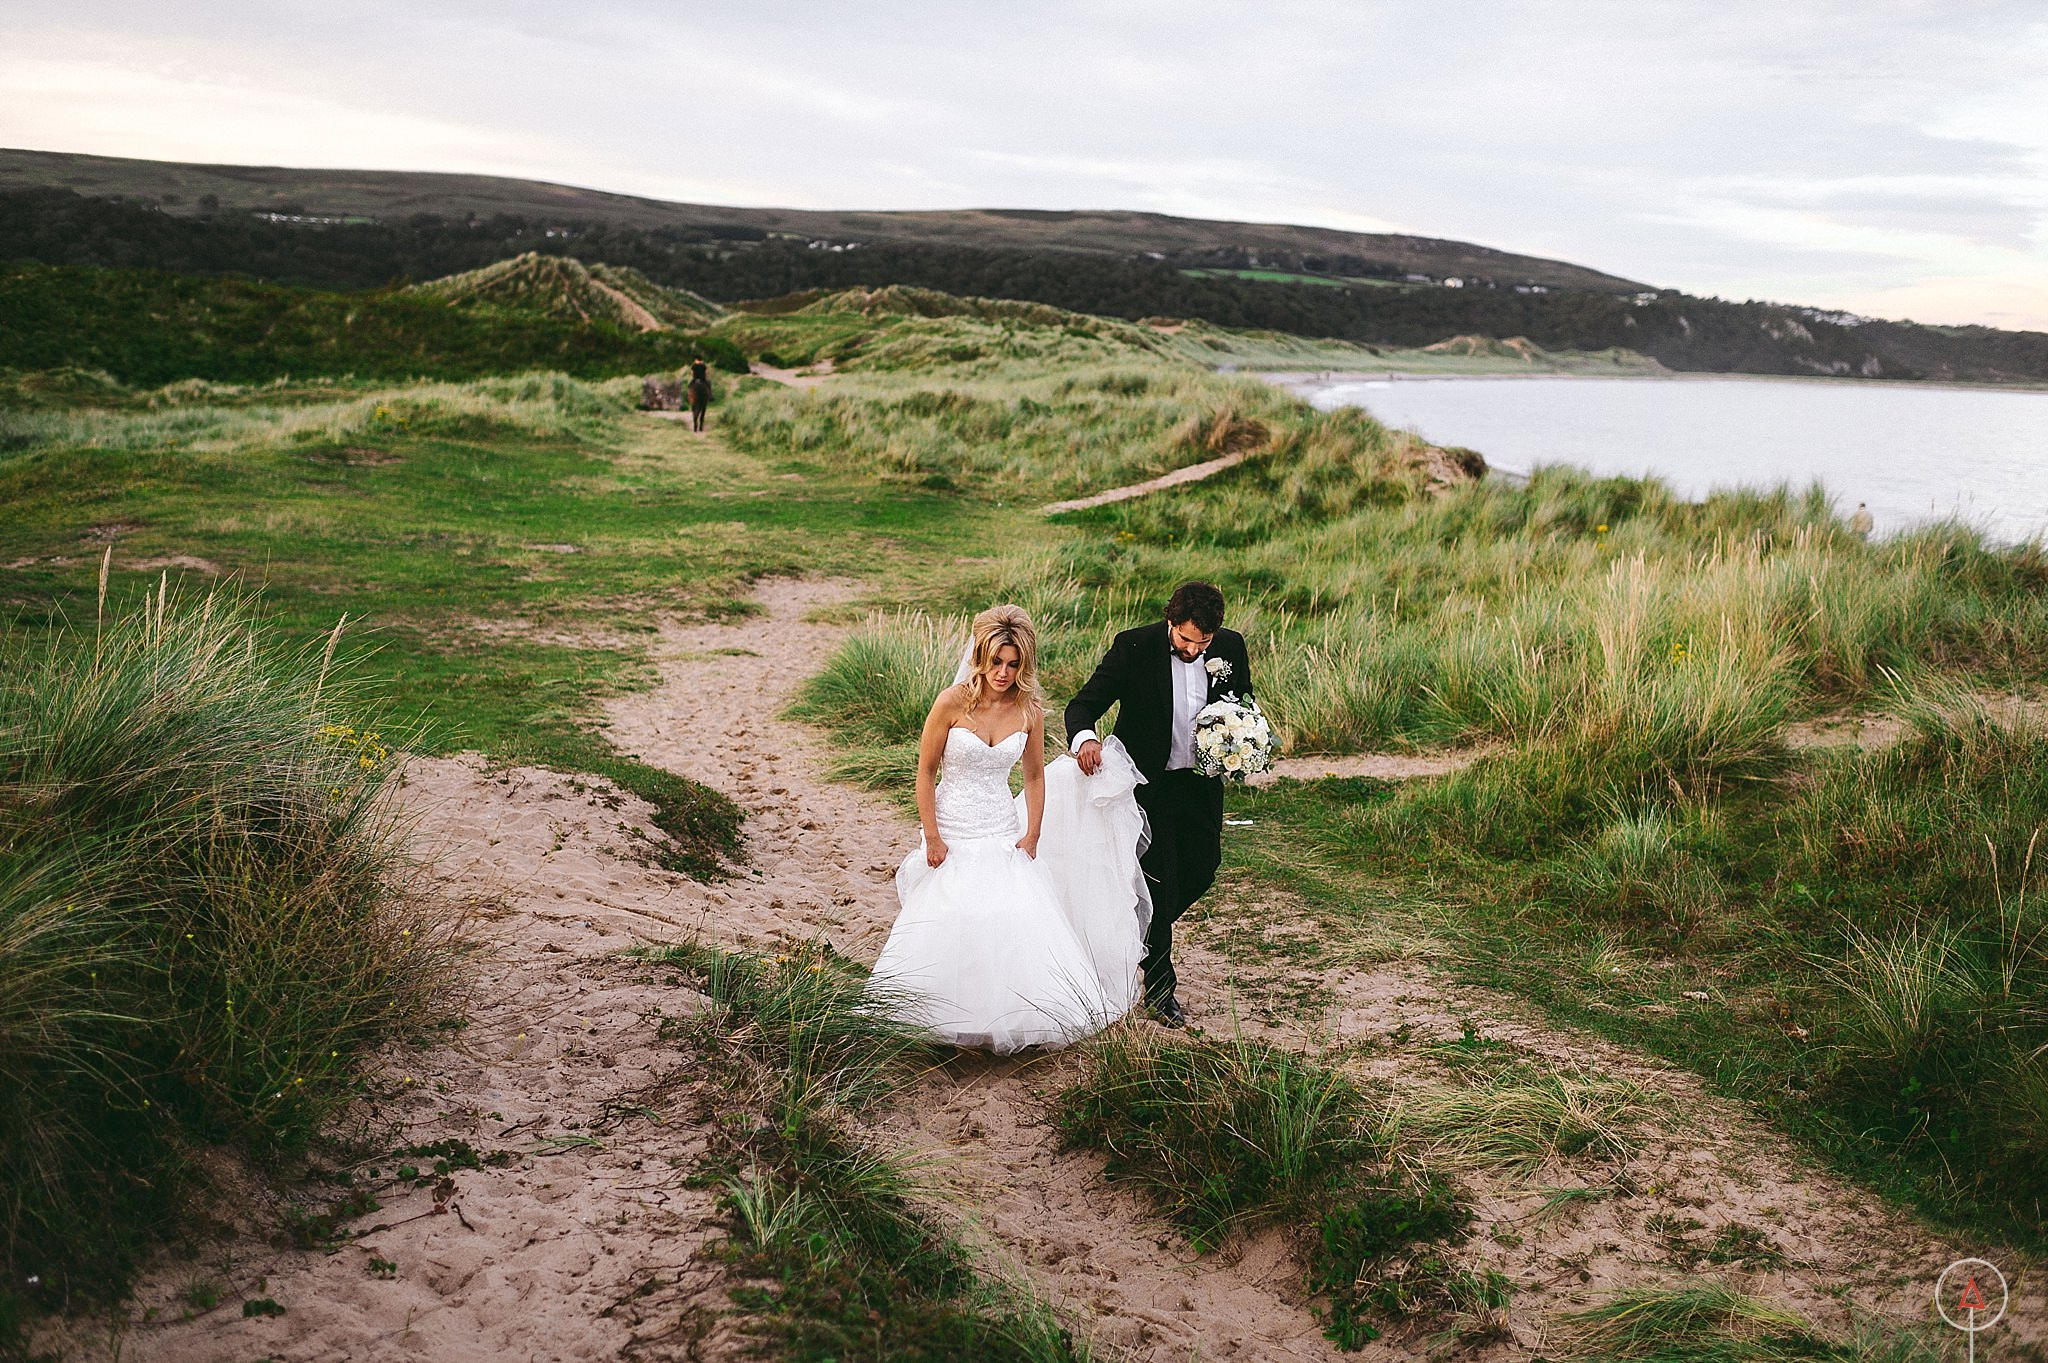 cardiff-wedding-photographer-aga-tomaszek_0400